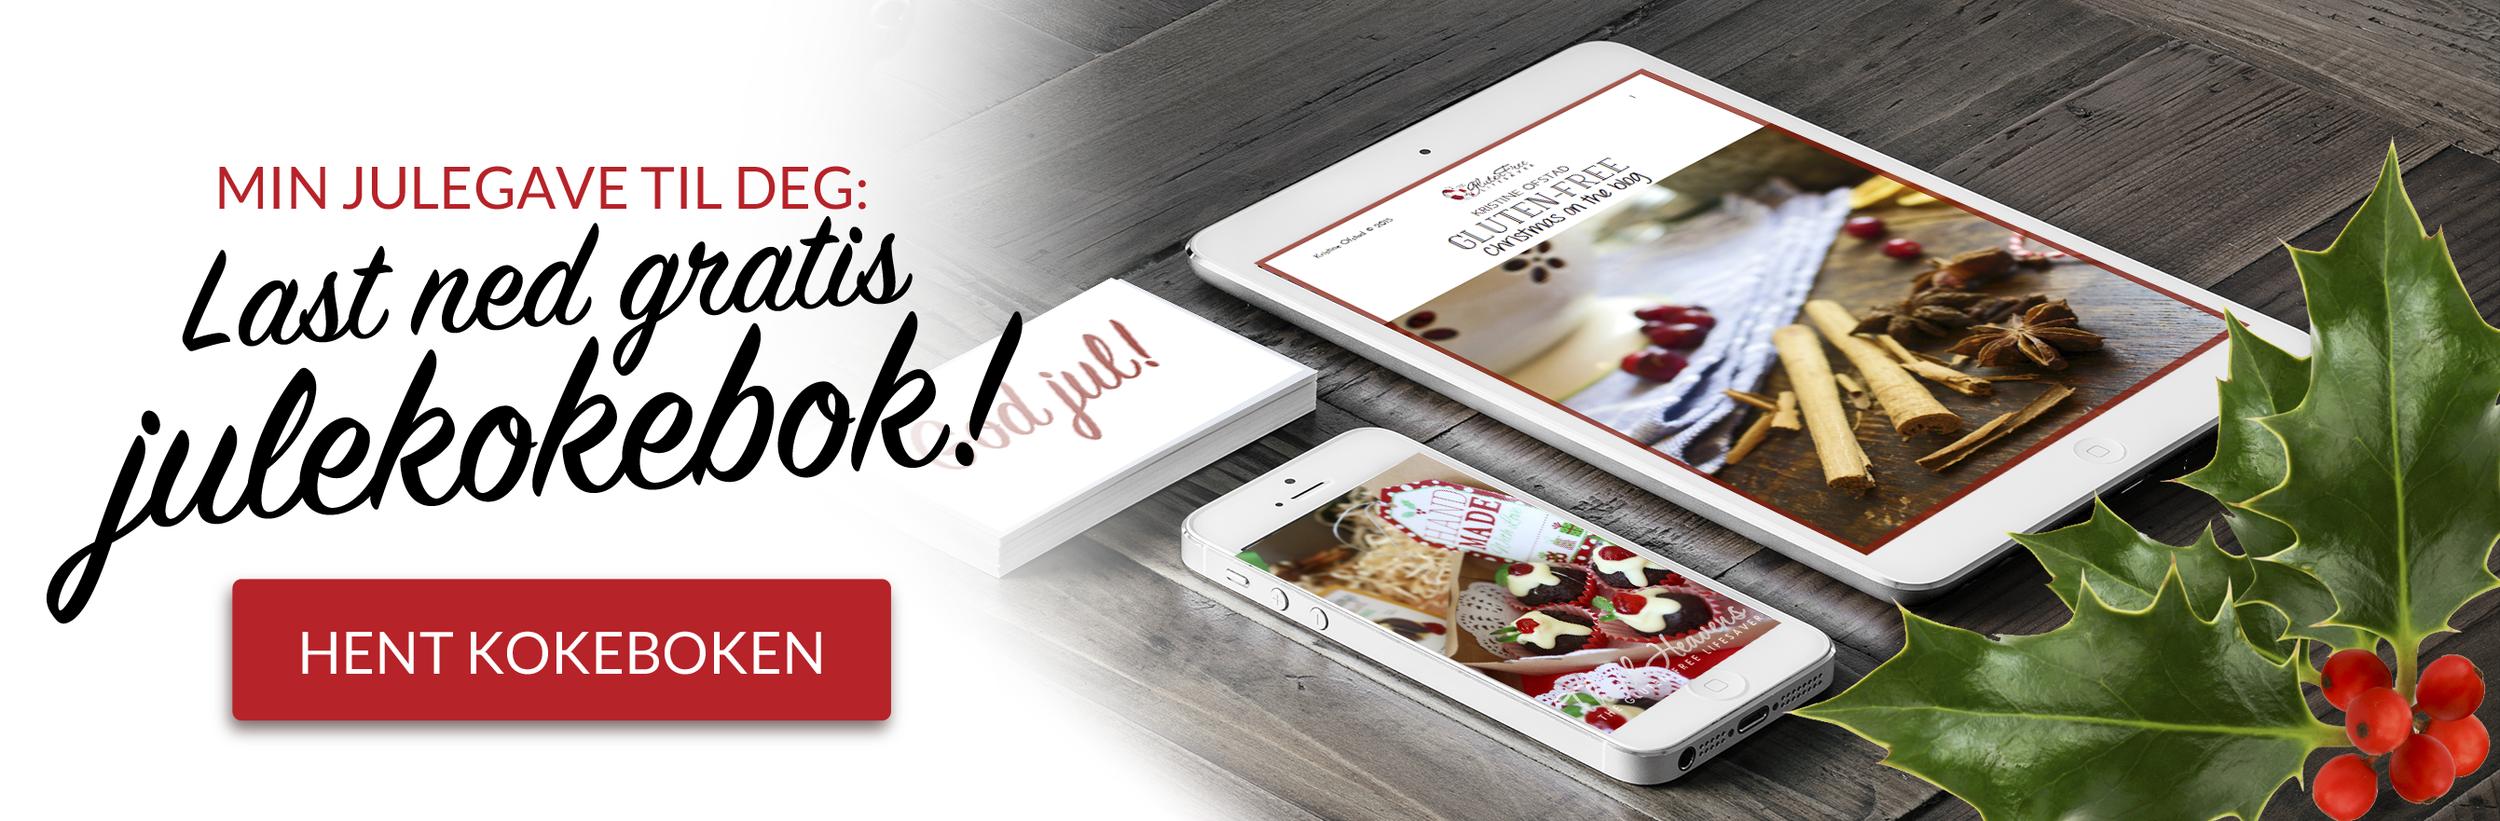 last ned gratis glutenfri kokebok med juleoppskrifter